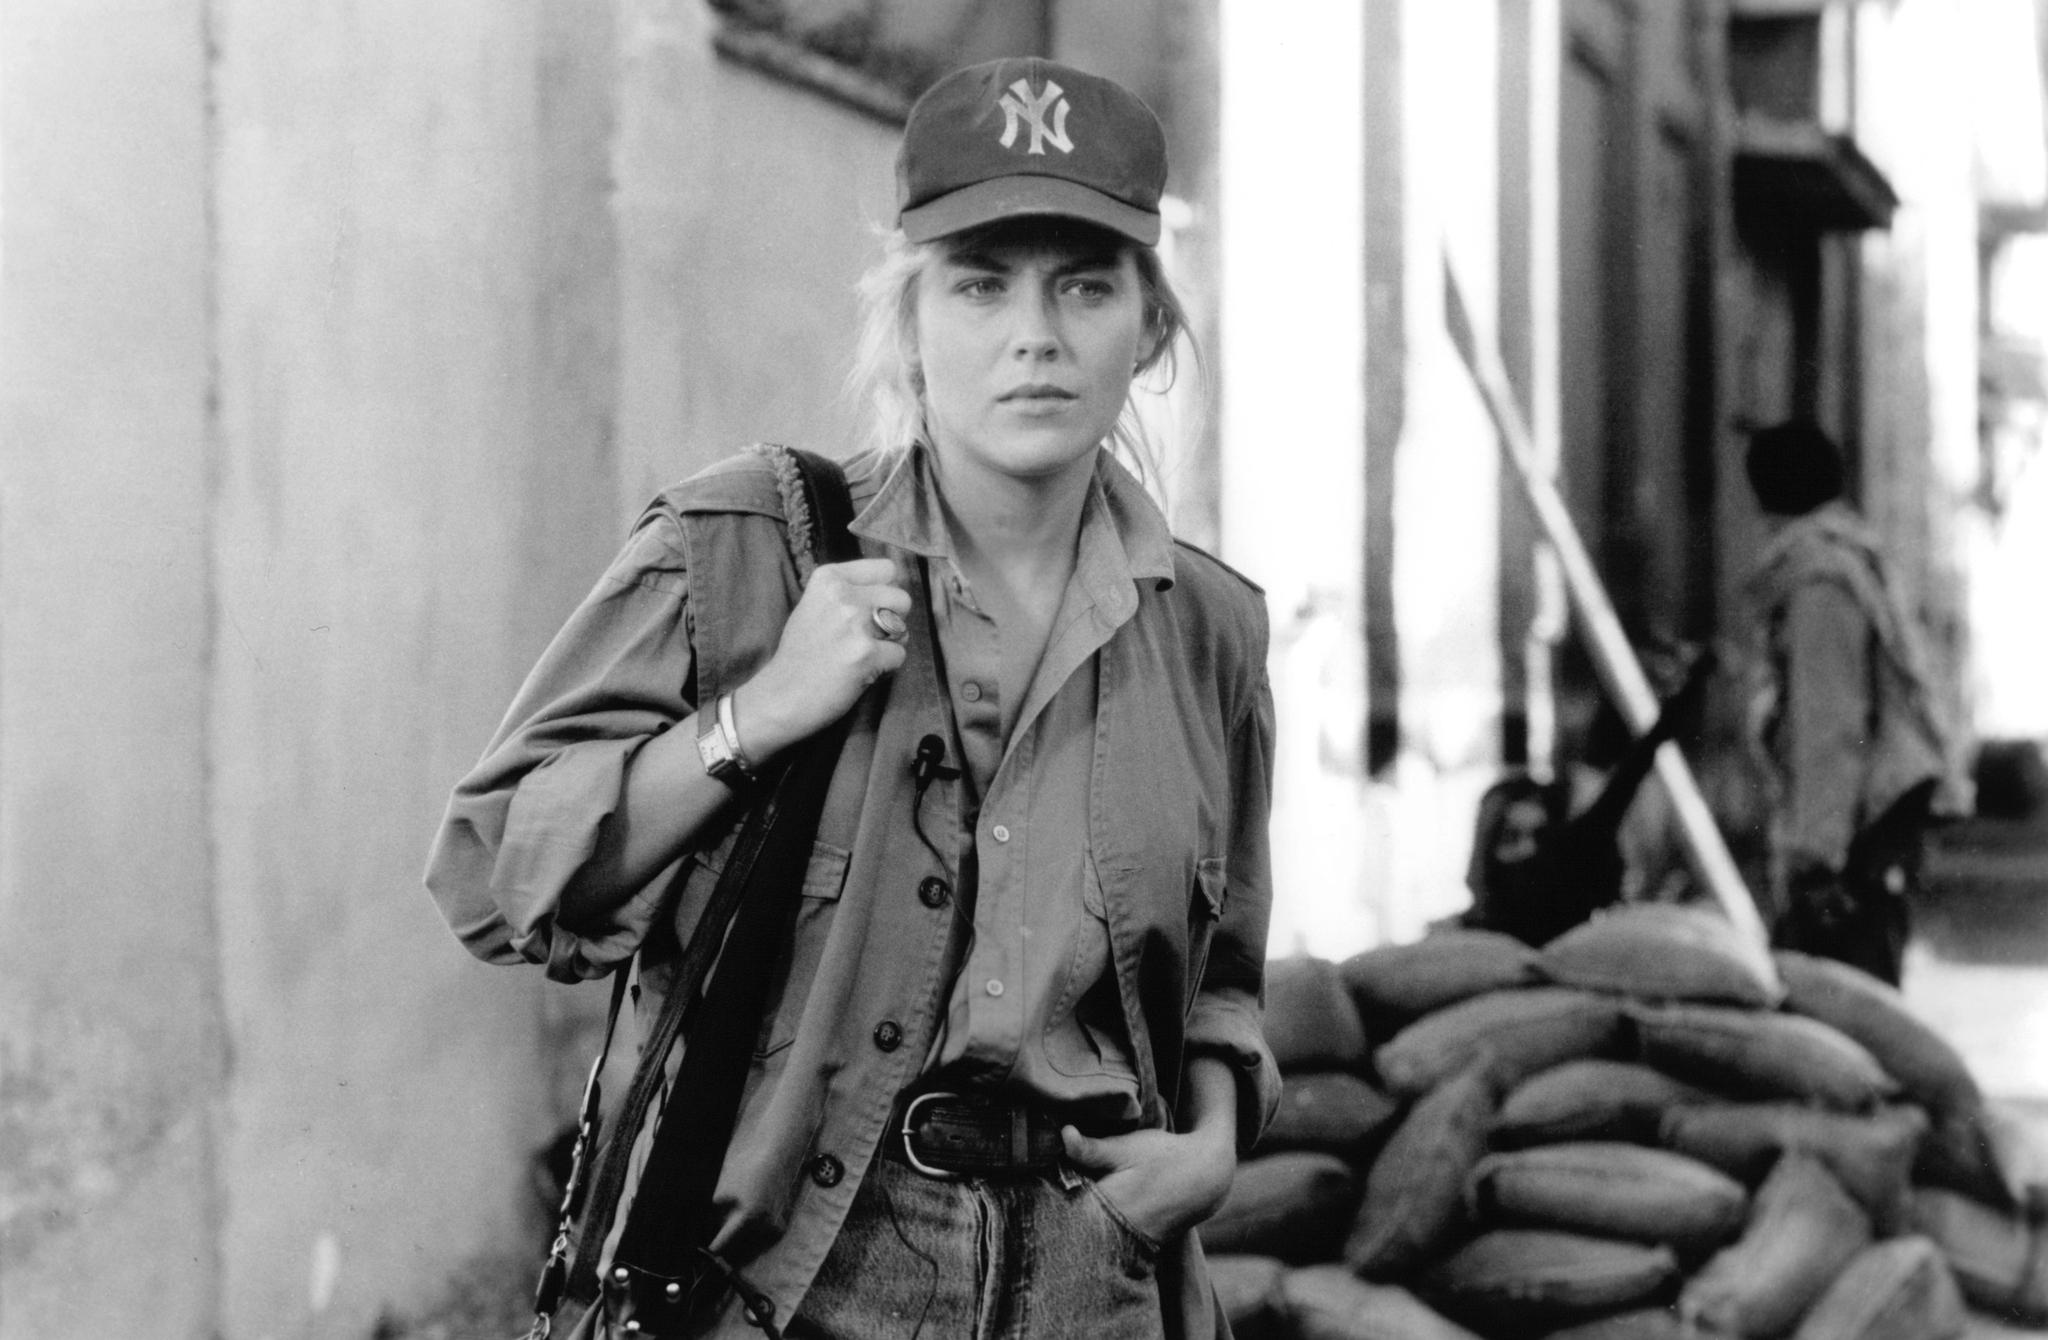 Sharon Stone in Year of the Gun (1991)